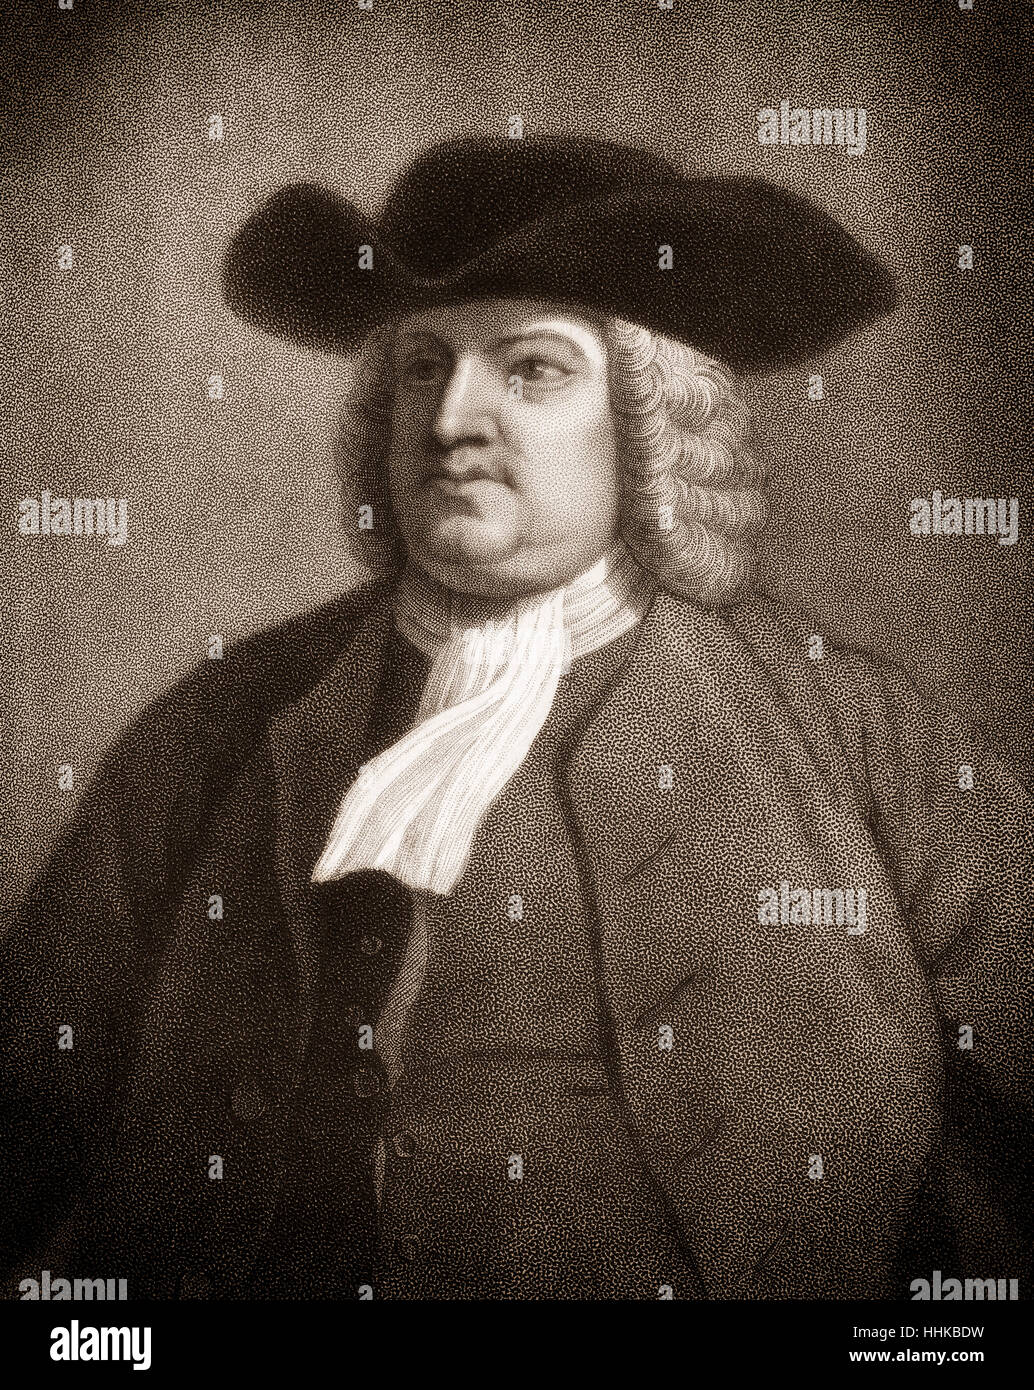 William Penn, 1644 - 1718, founder of the colony of Pennsylvania Stock Photo